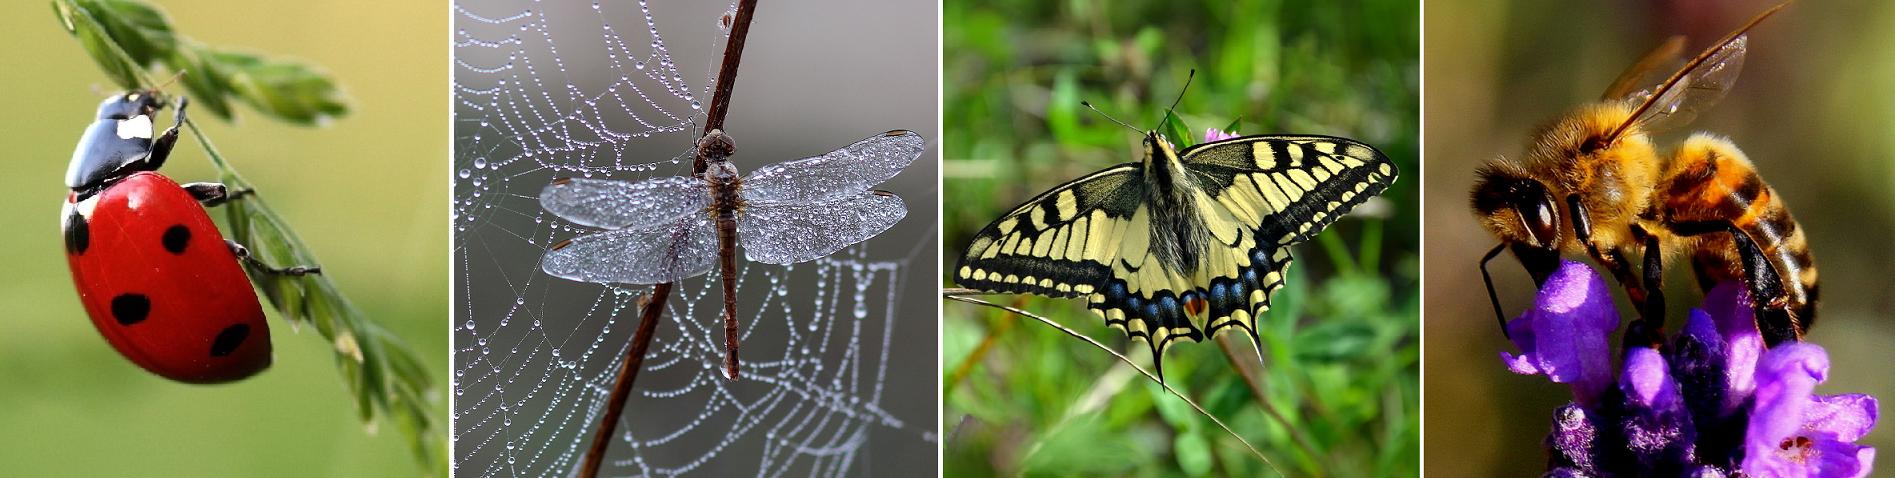 Biodiversity - ladybug, dragonfly, butterfly, bee